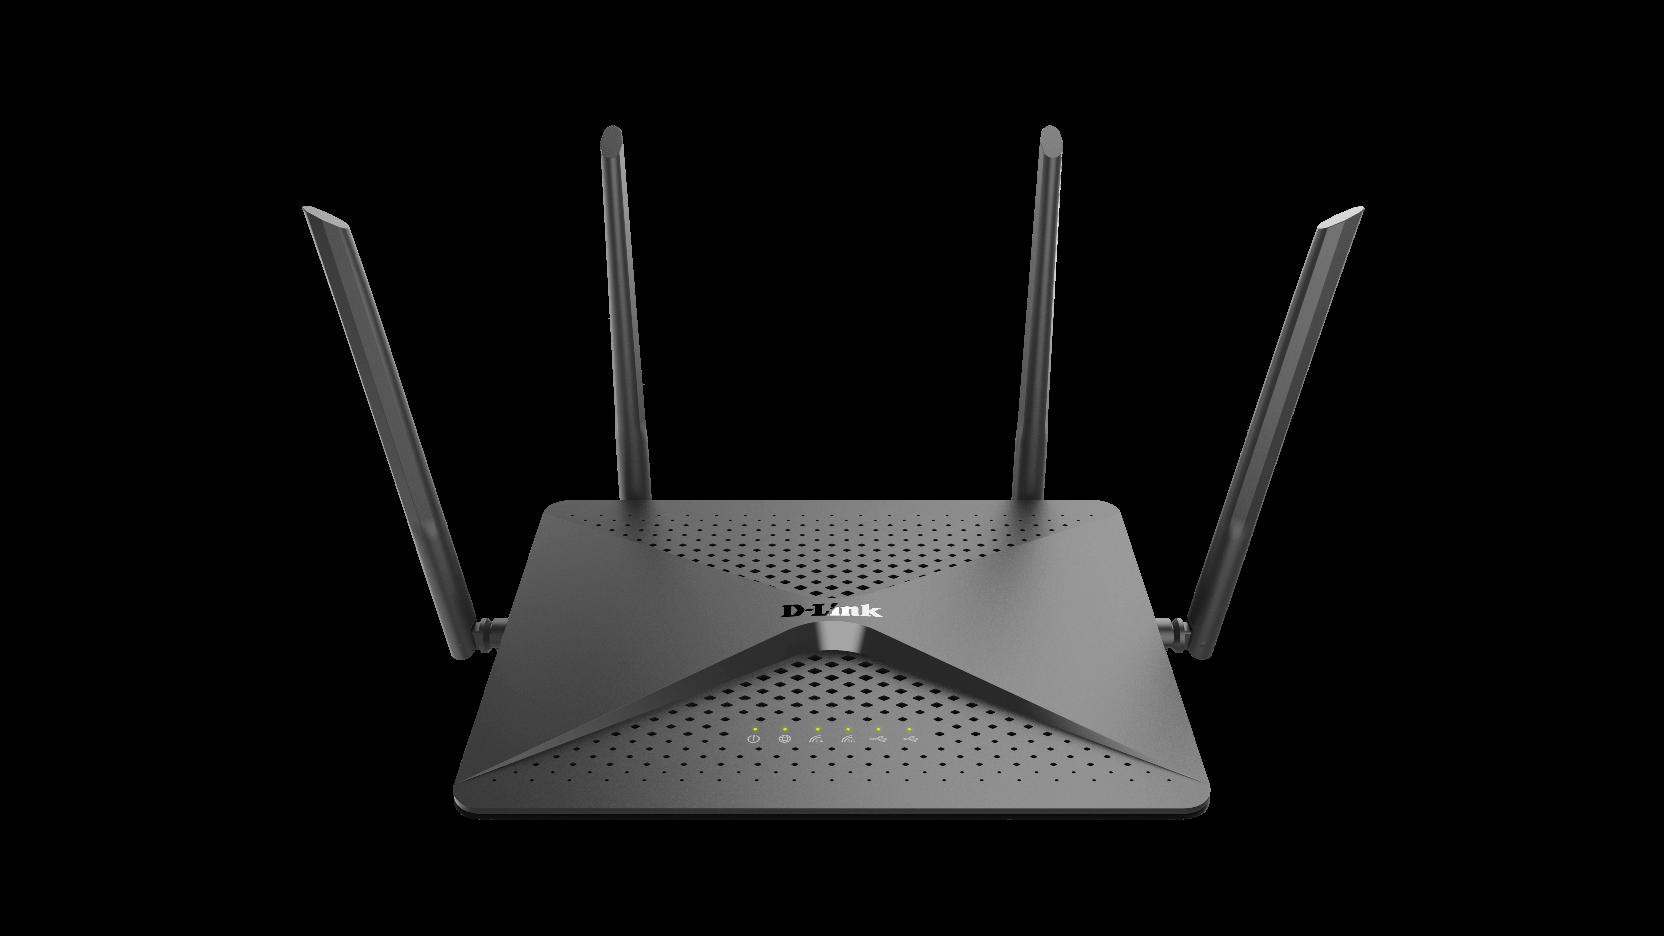 DIR-882 EXO AC2600 MU-MIMO Wi-Fi Router